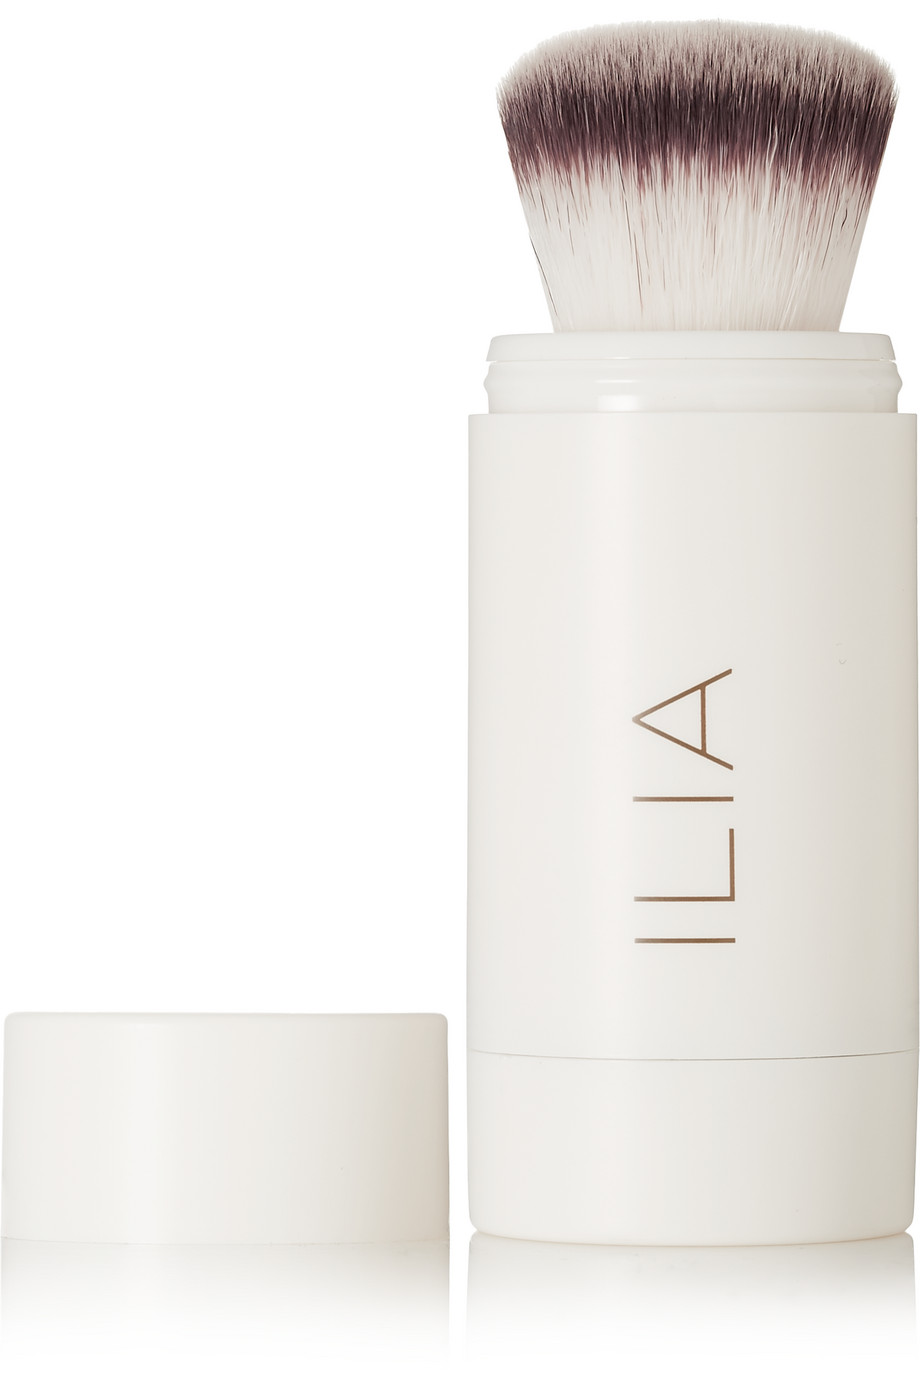 Ilia sunscreen powder